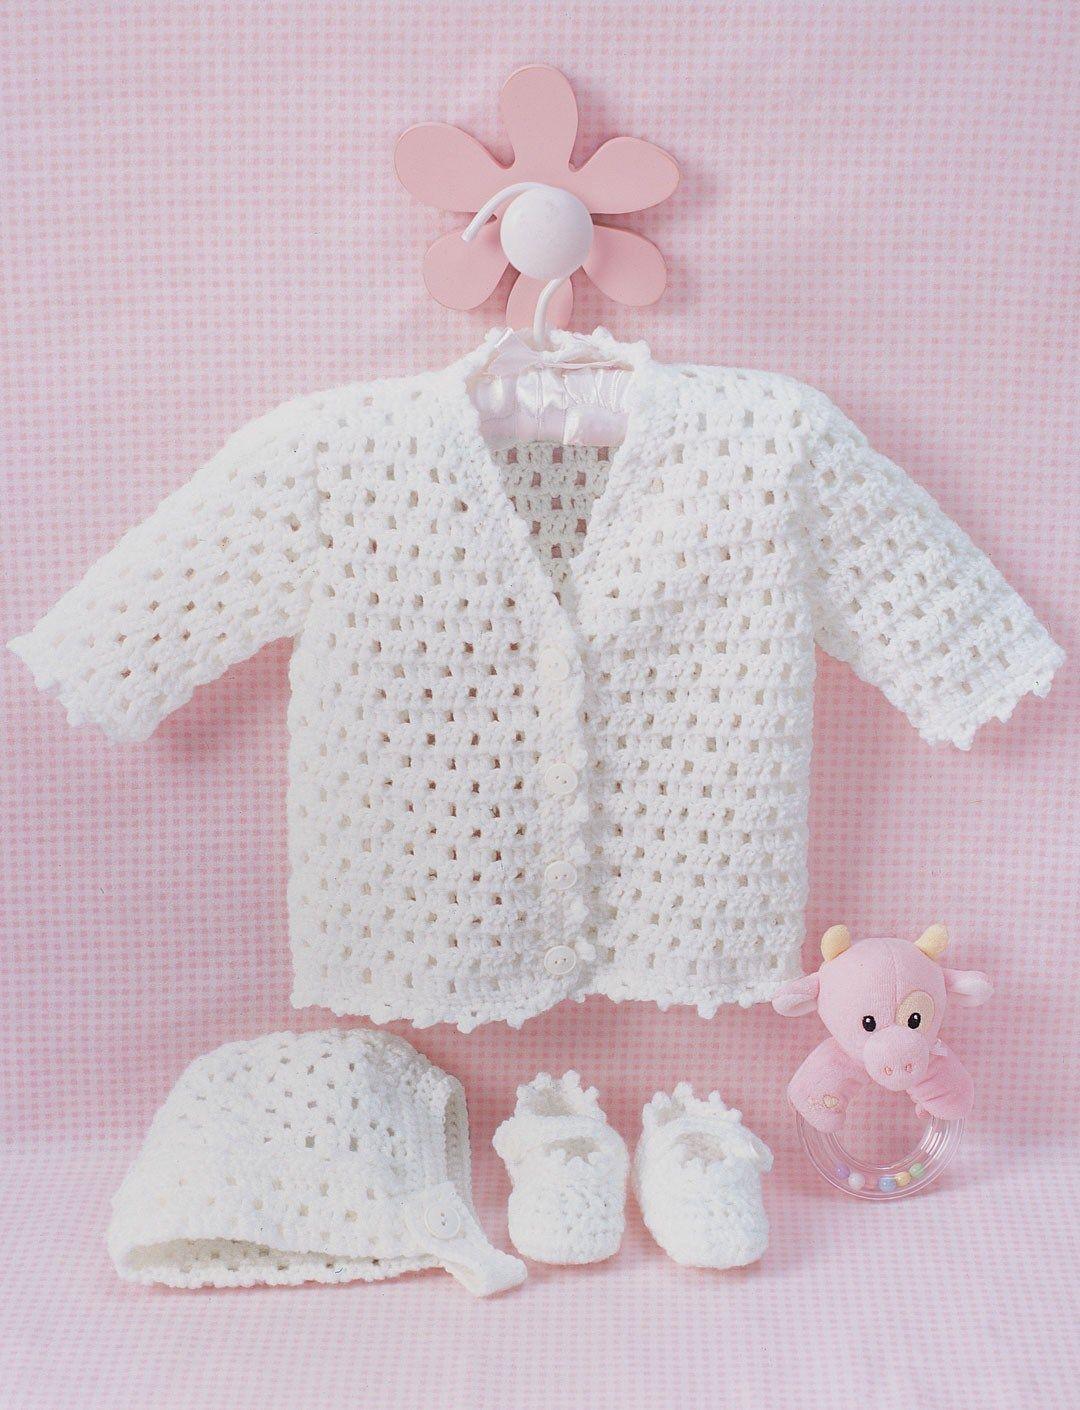 FREE Baby Set Crochet Patterns   Pinterest   Free pattern, Crochet ...